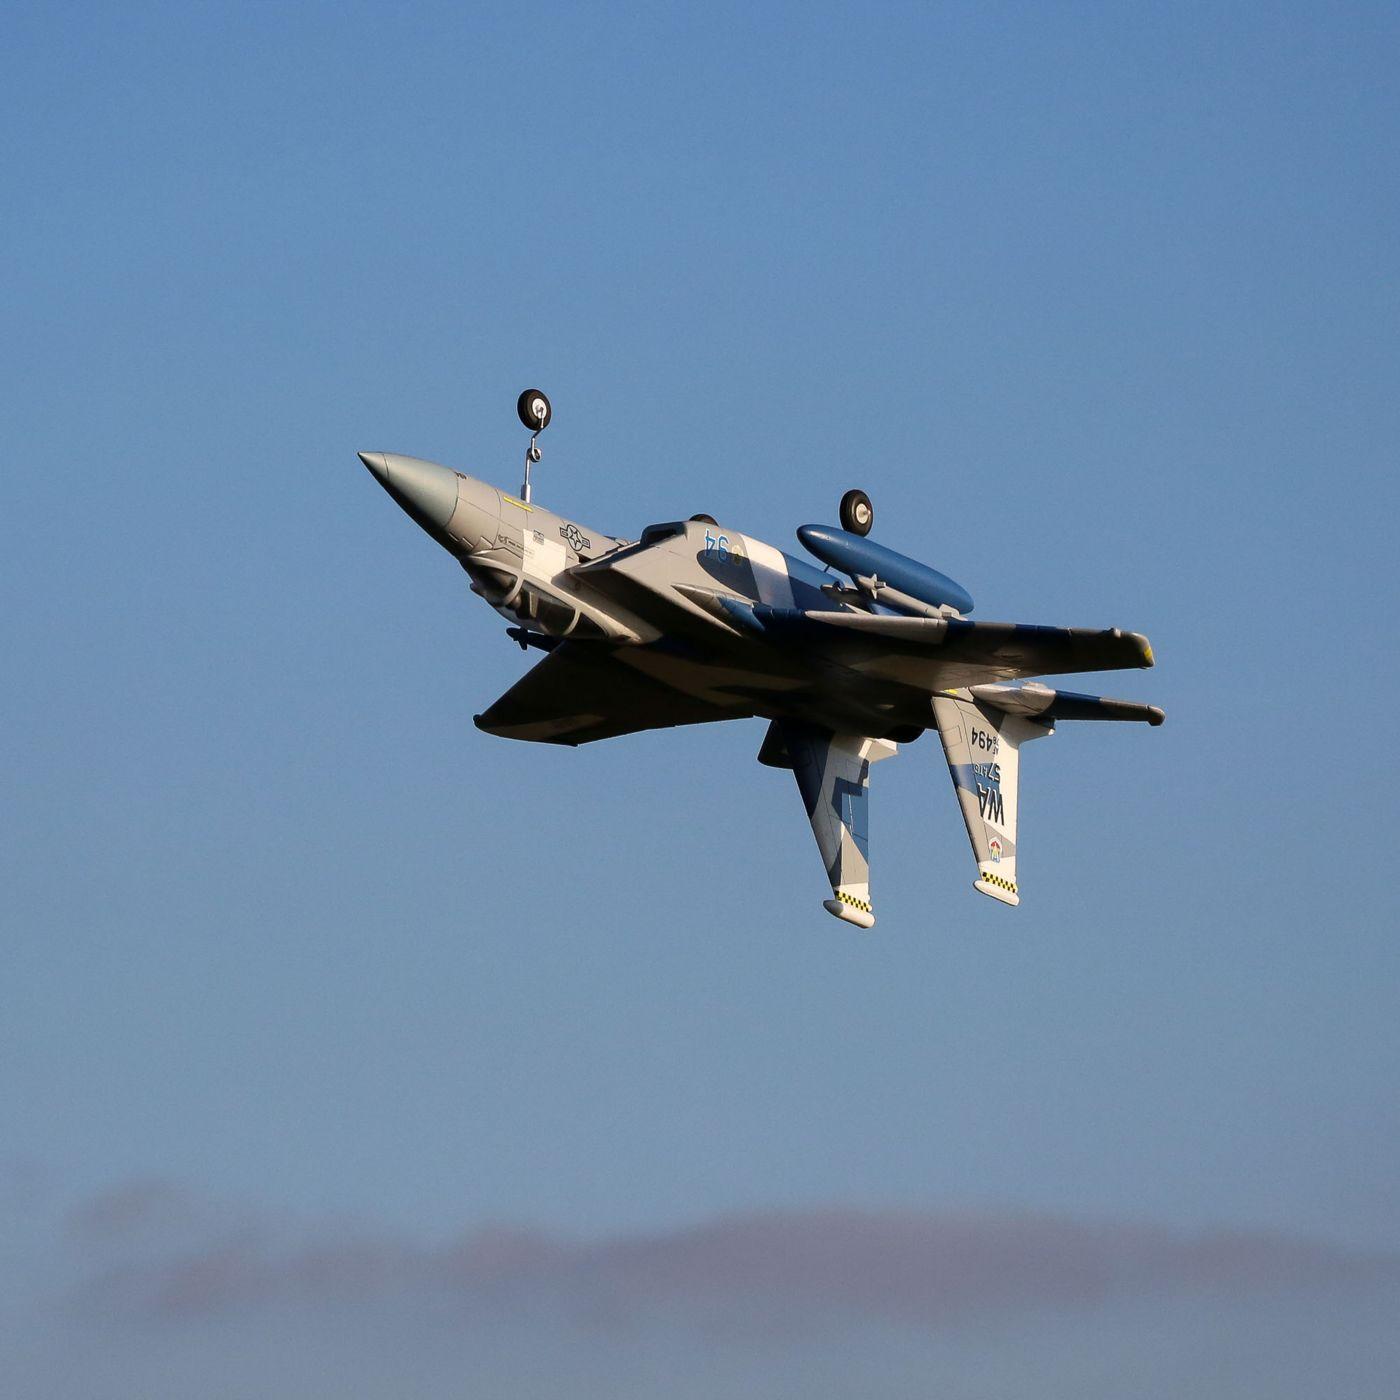 E-flite F-15 Eagle EDF 64mm BNF Basic Safe As3x 04